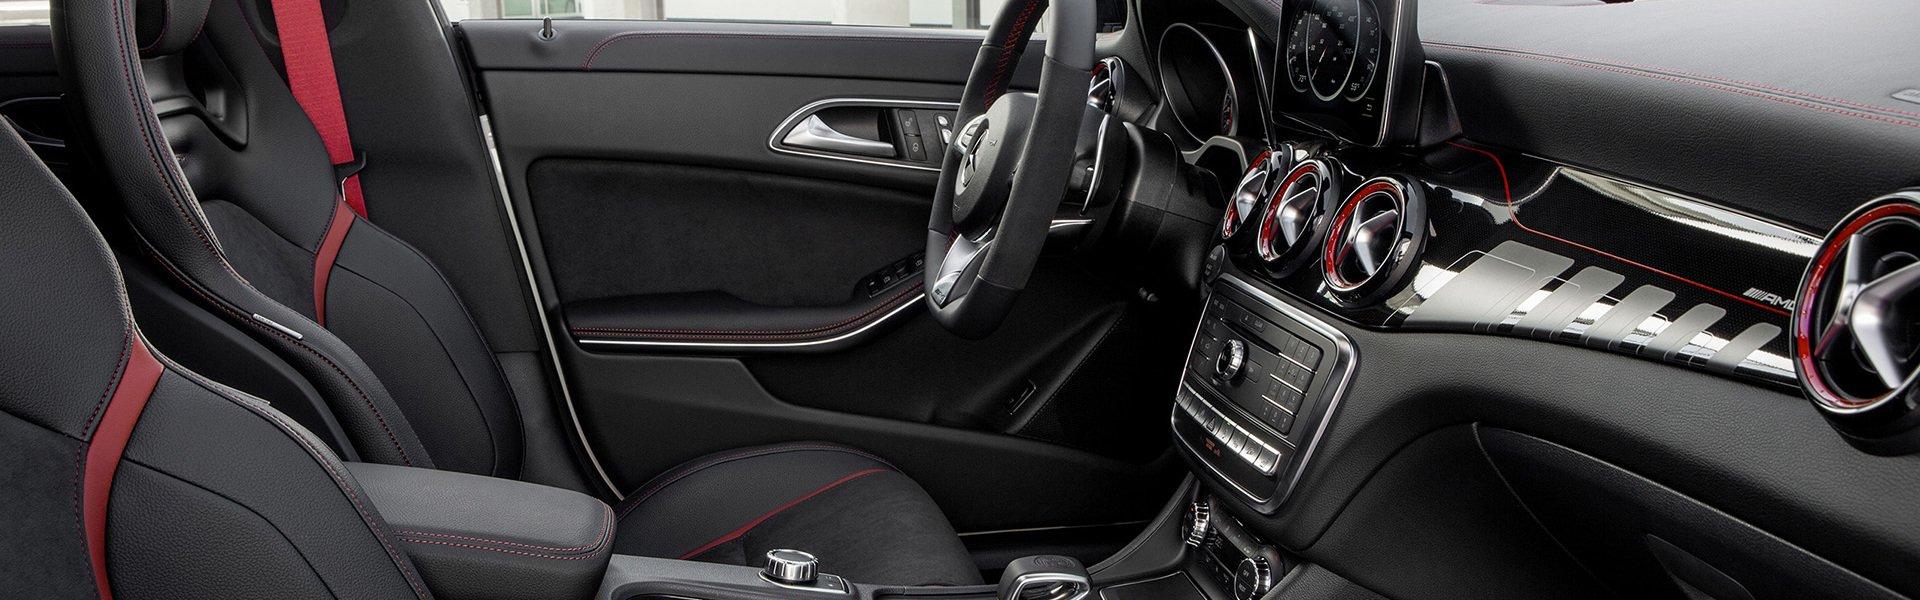 Mercedes-AMG CLA Shooting Brake